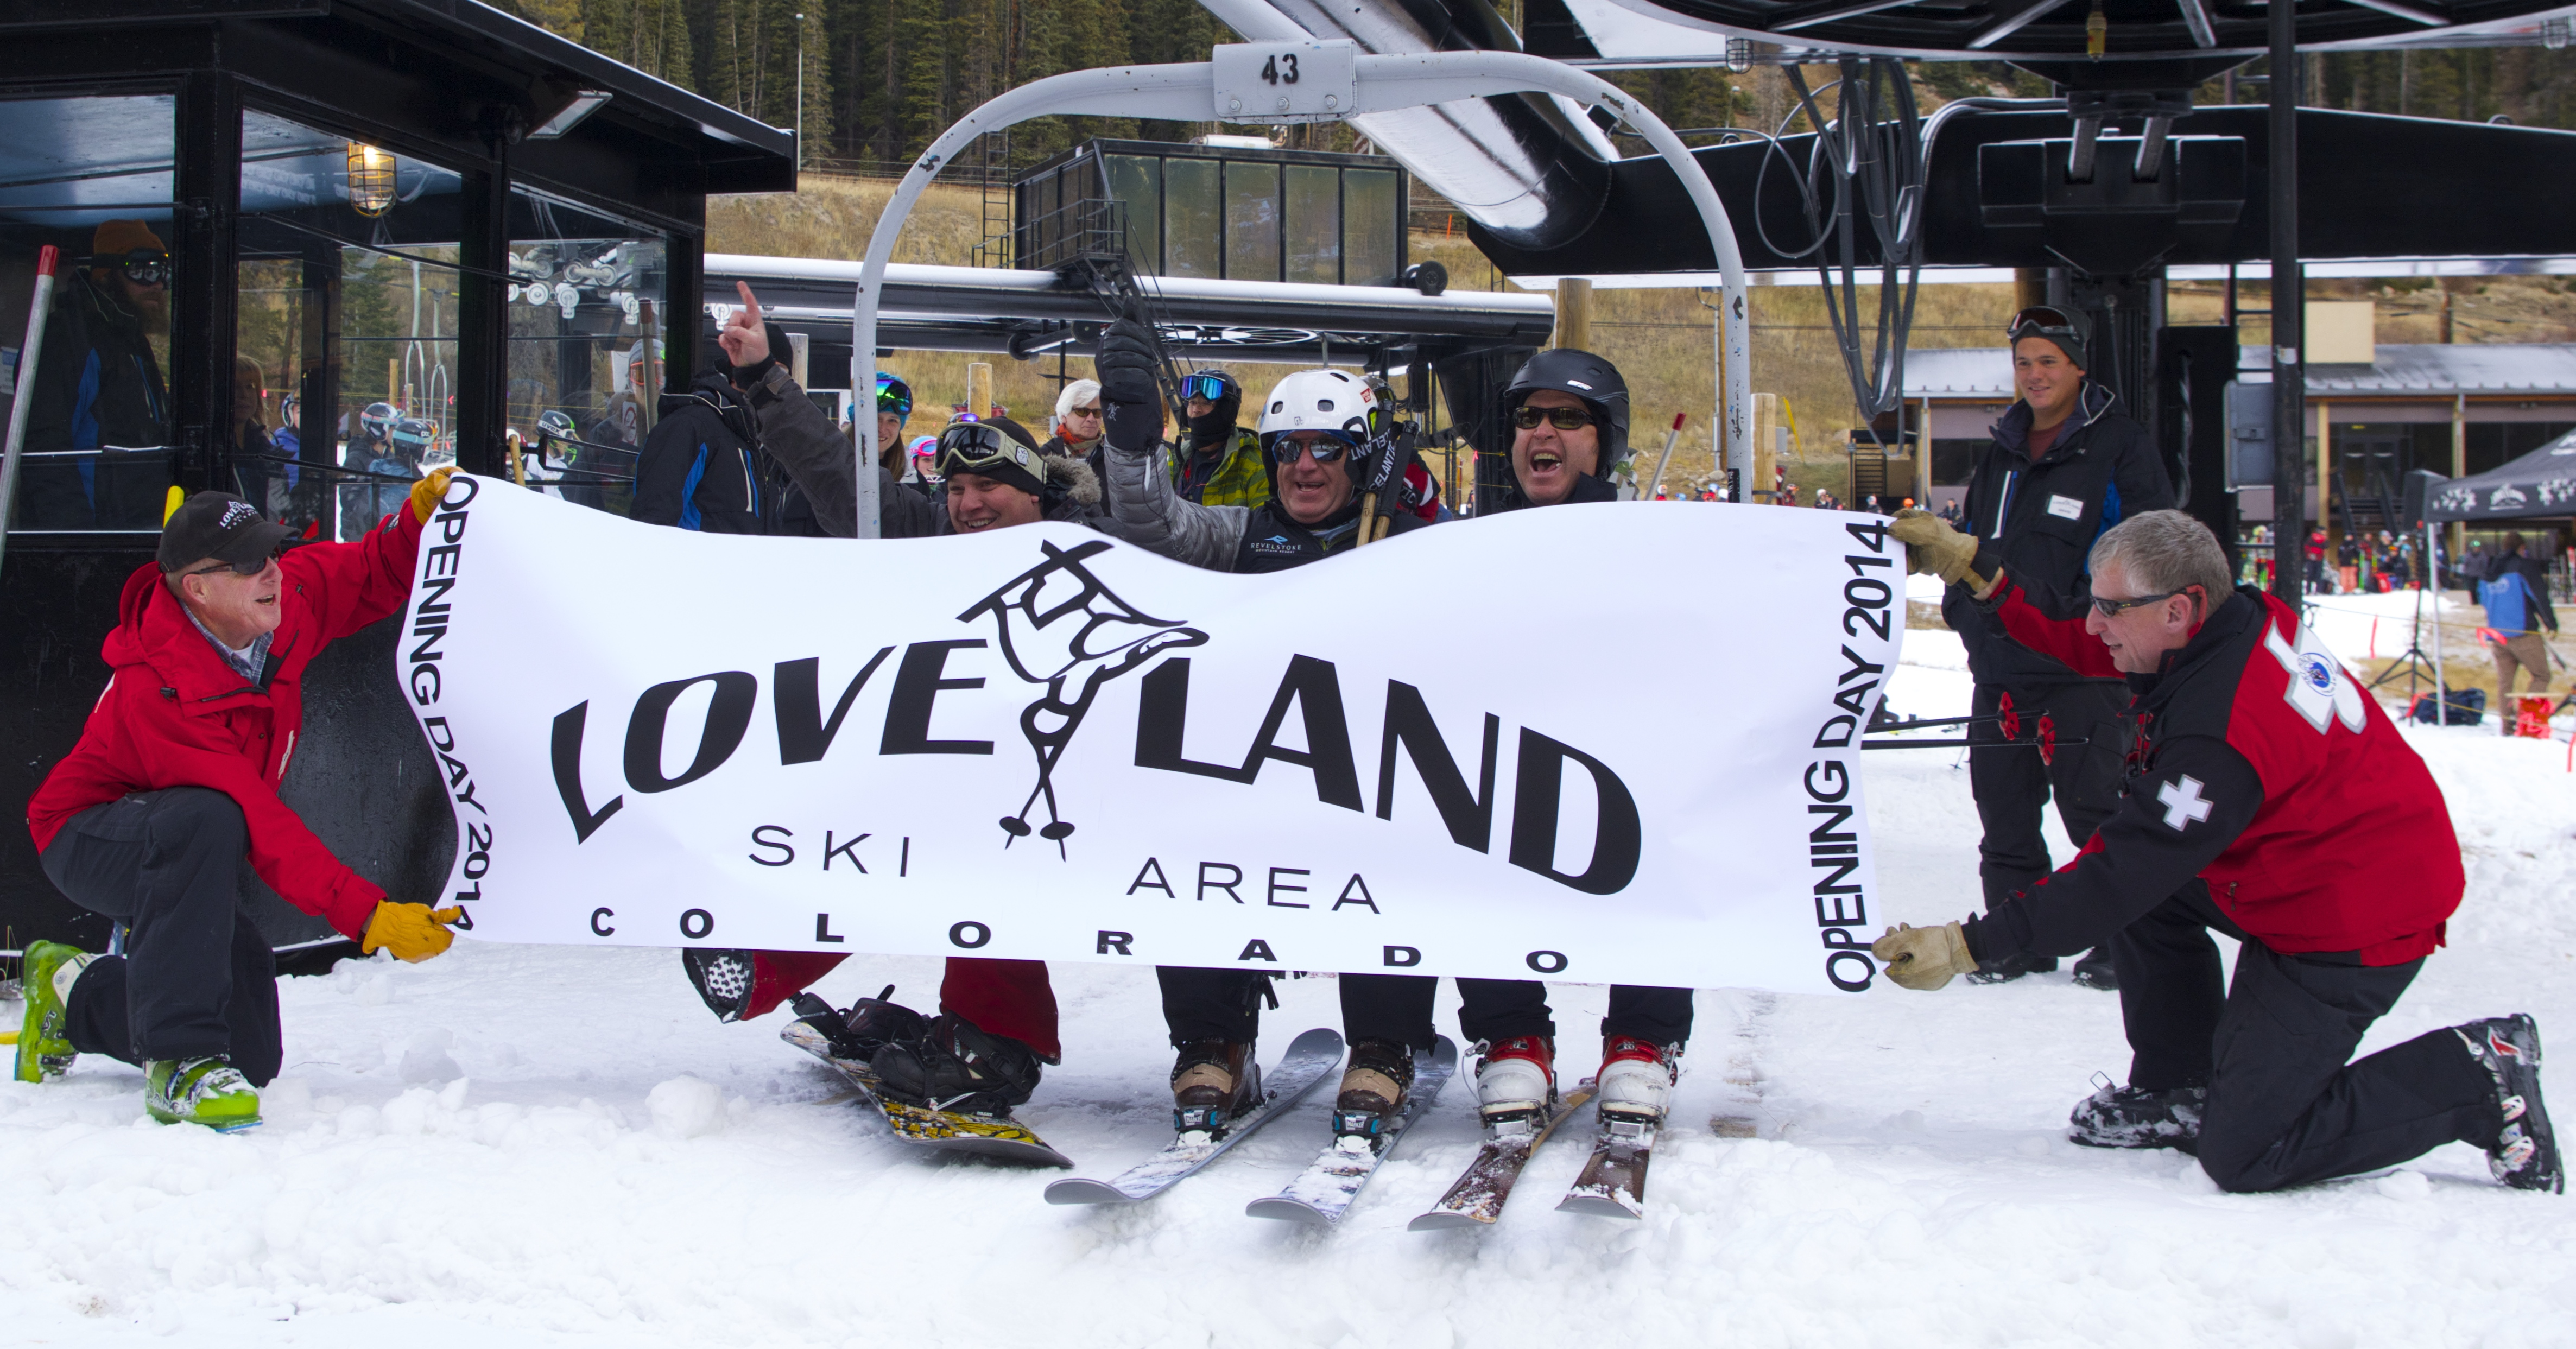 Colorado ski season to begin Thursday at Loveland Ski Area | FOX31 Denver